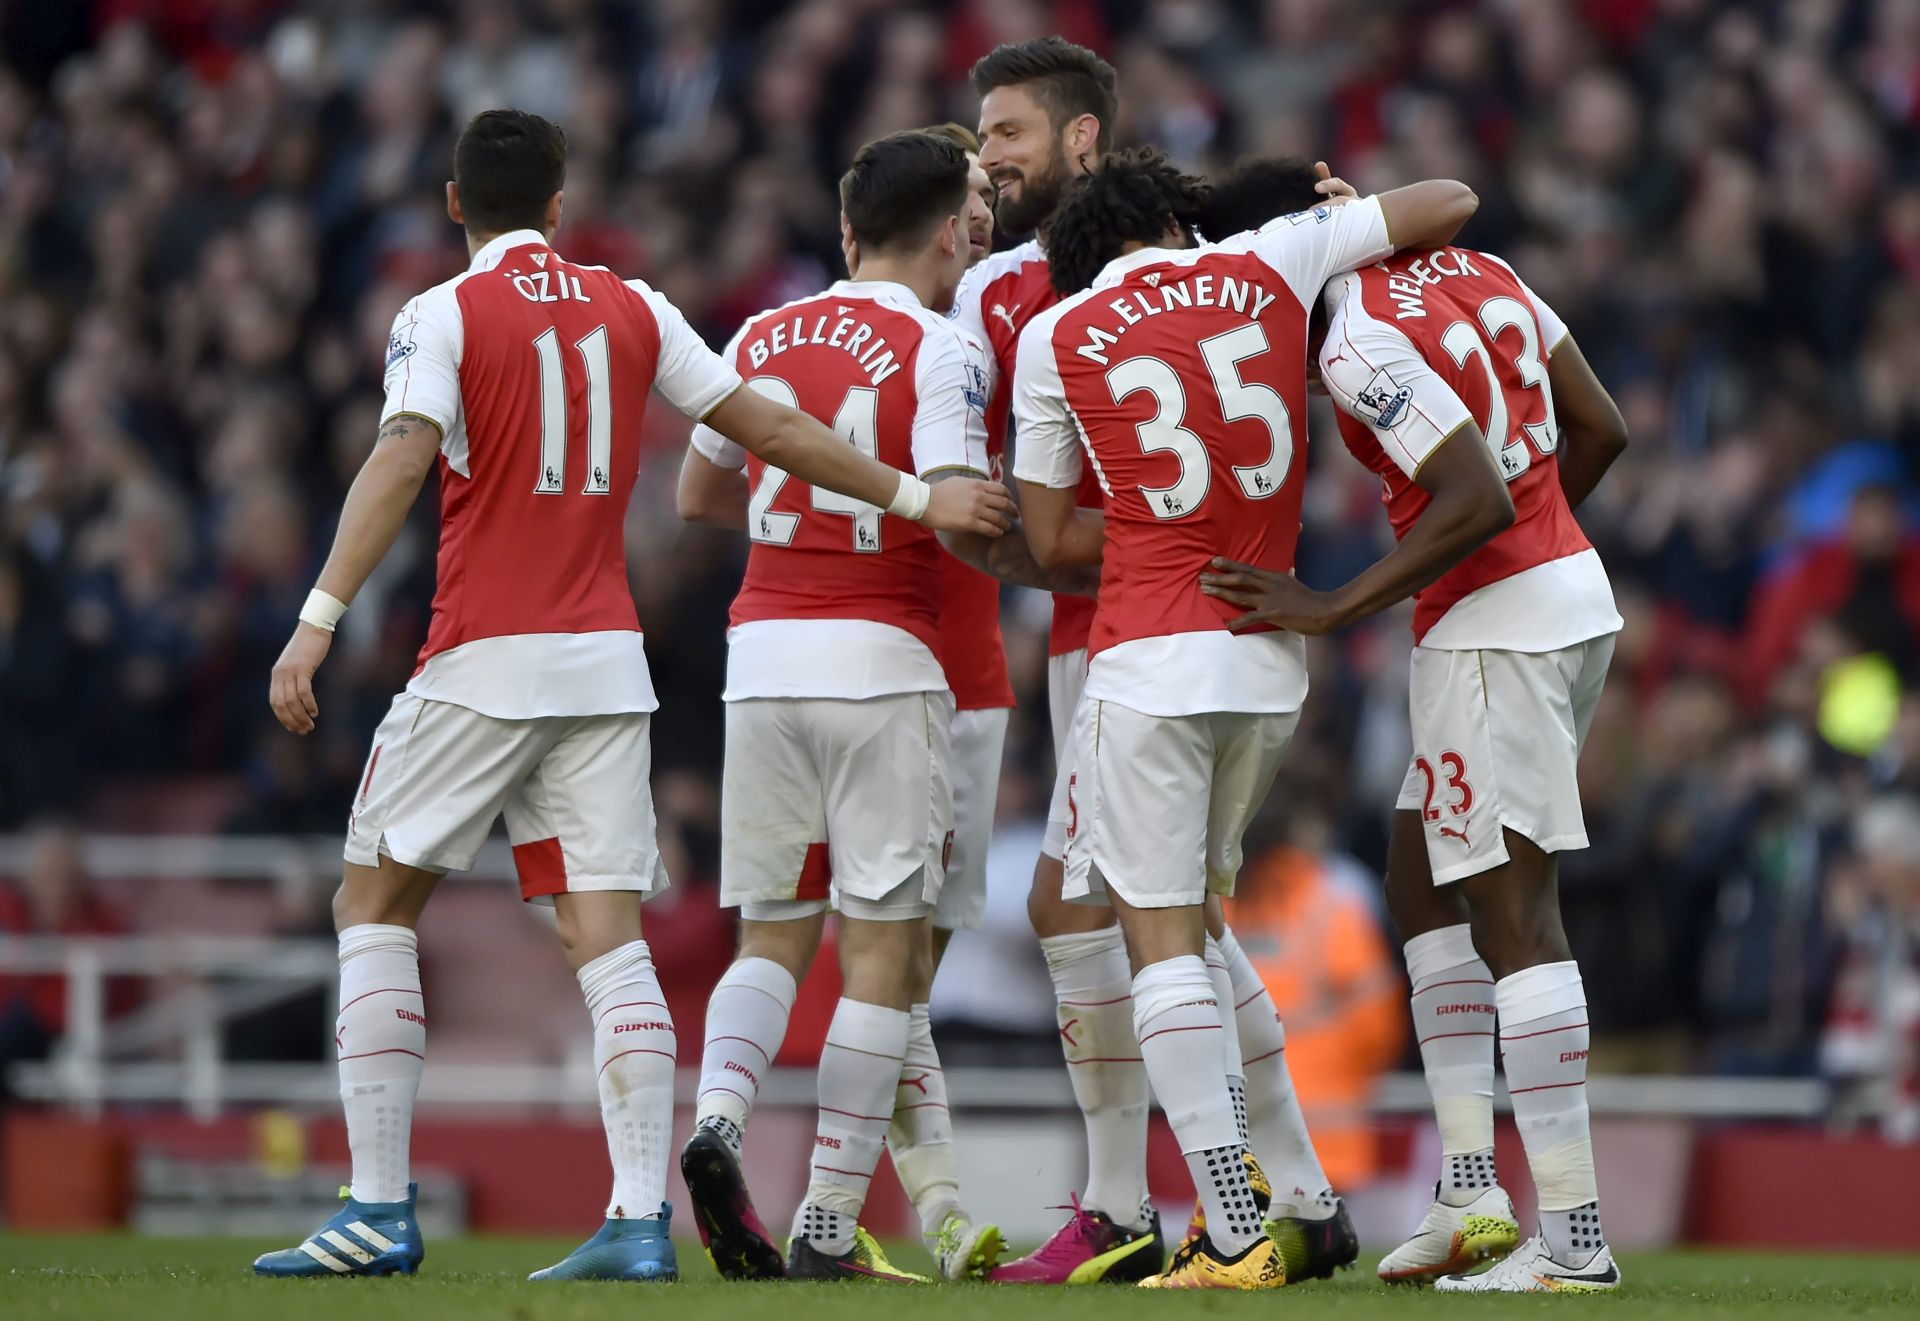 OZLJEDA MIŠIĆA: Arsenal bez Ramseya na Chelsea i Bayern